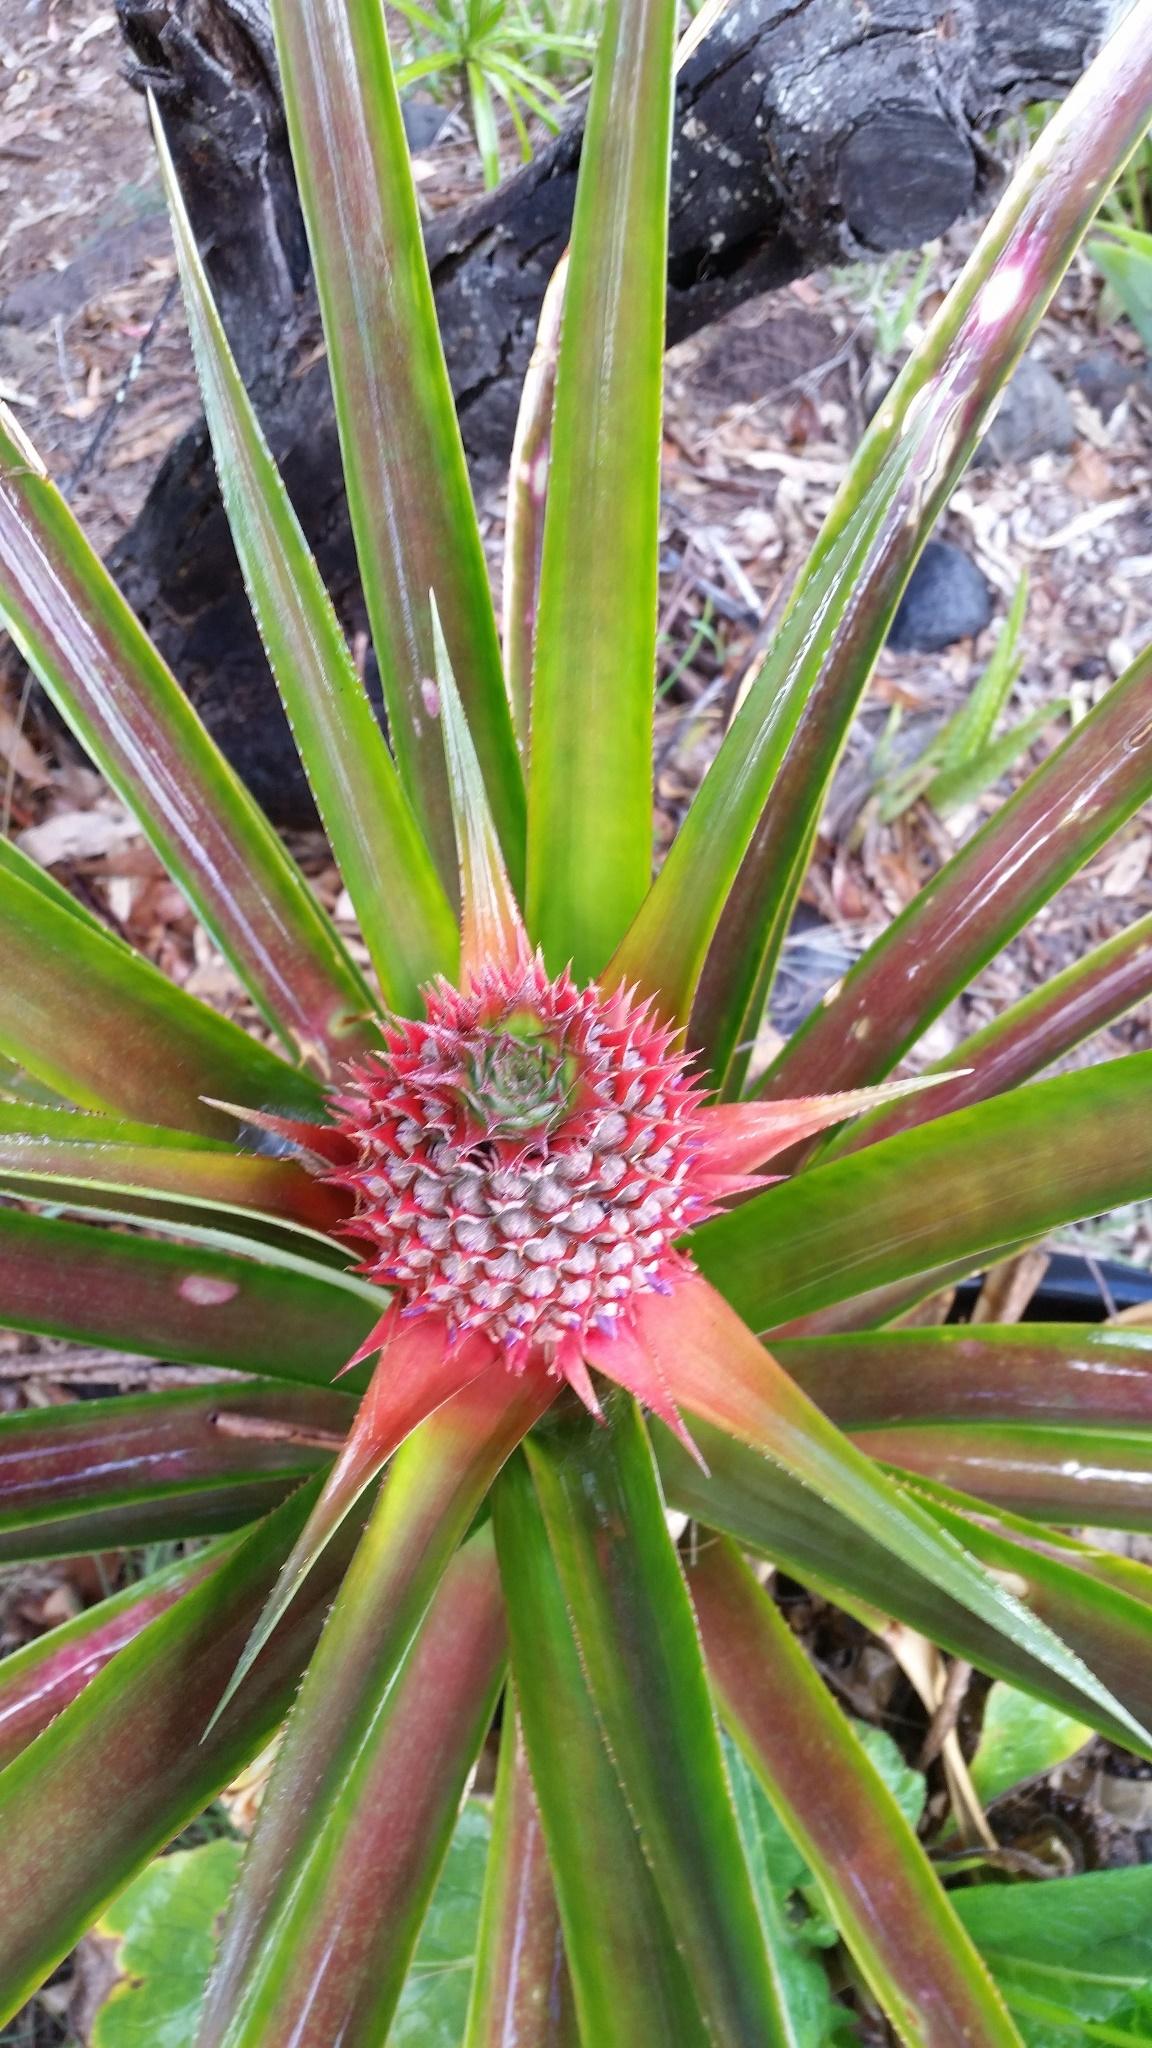 Pineapple - 2018